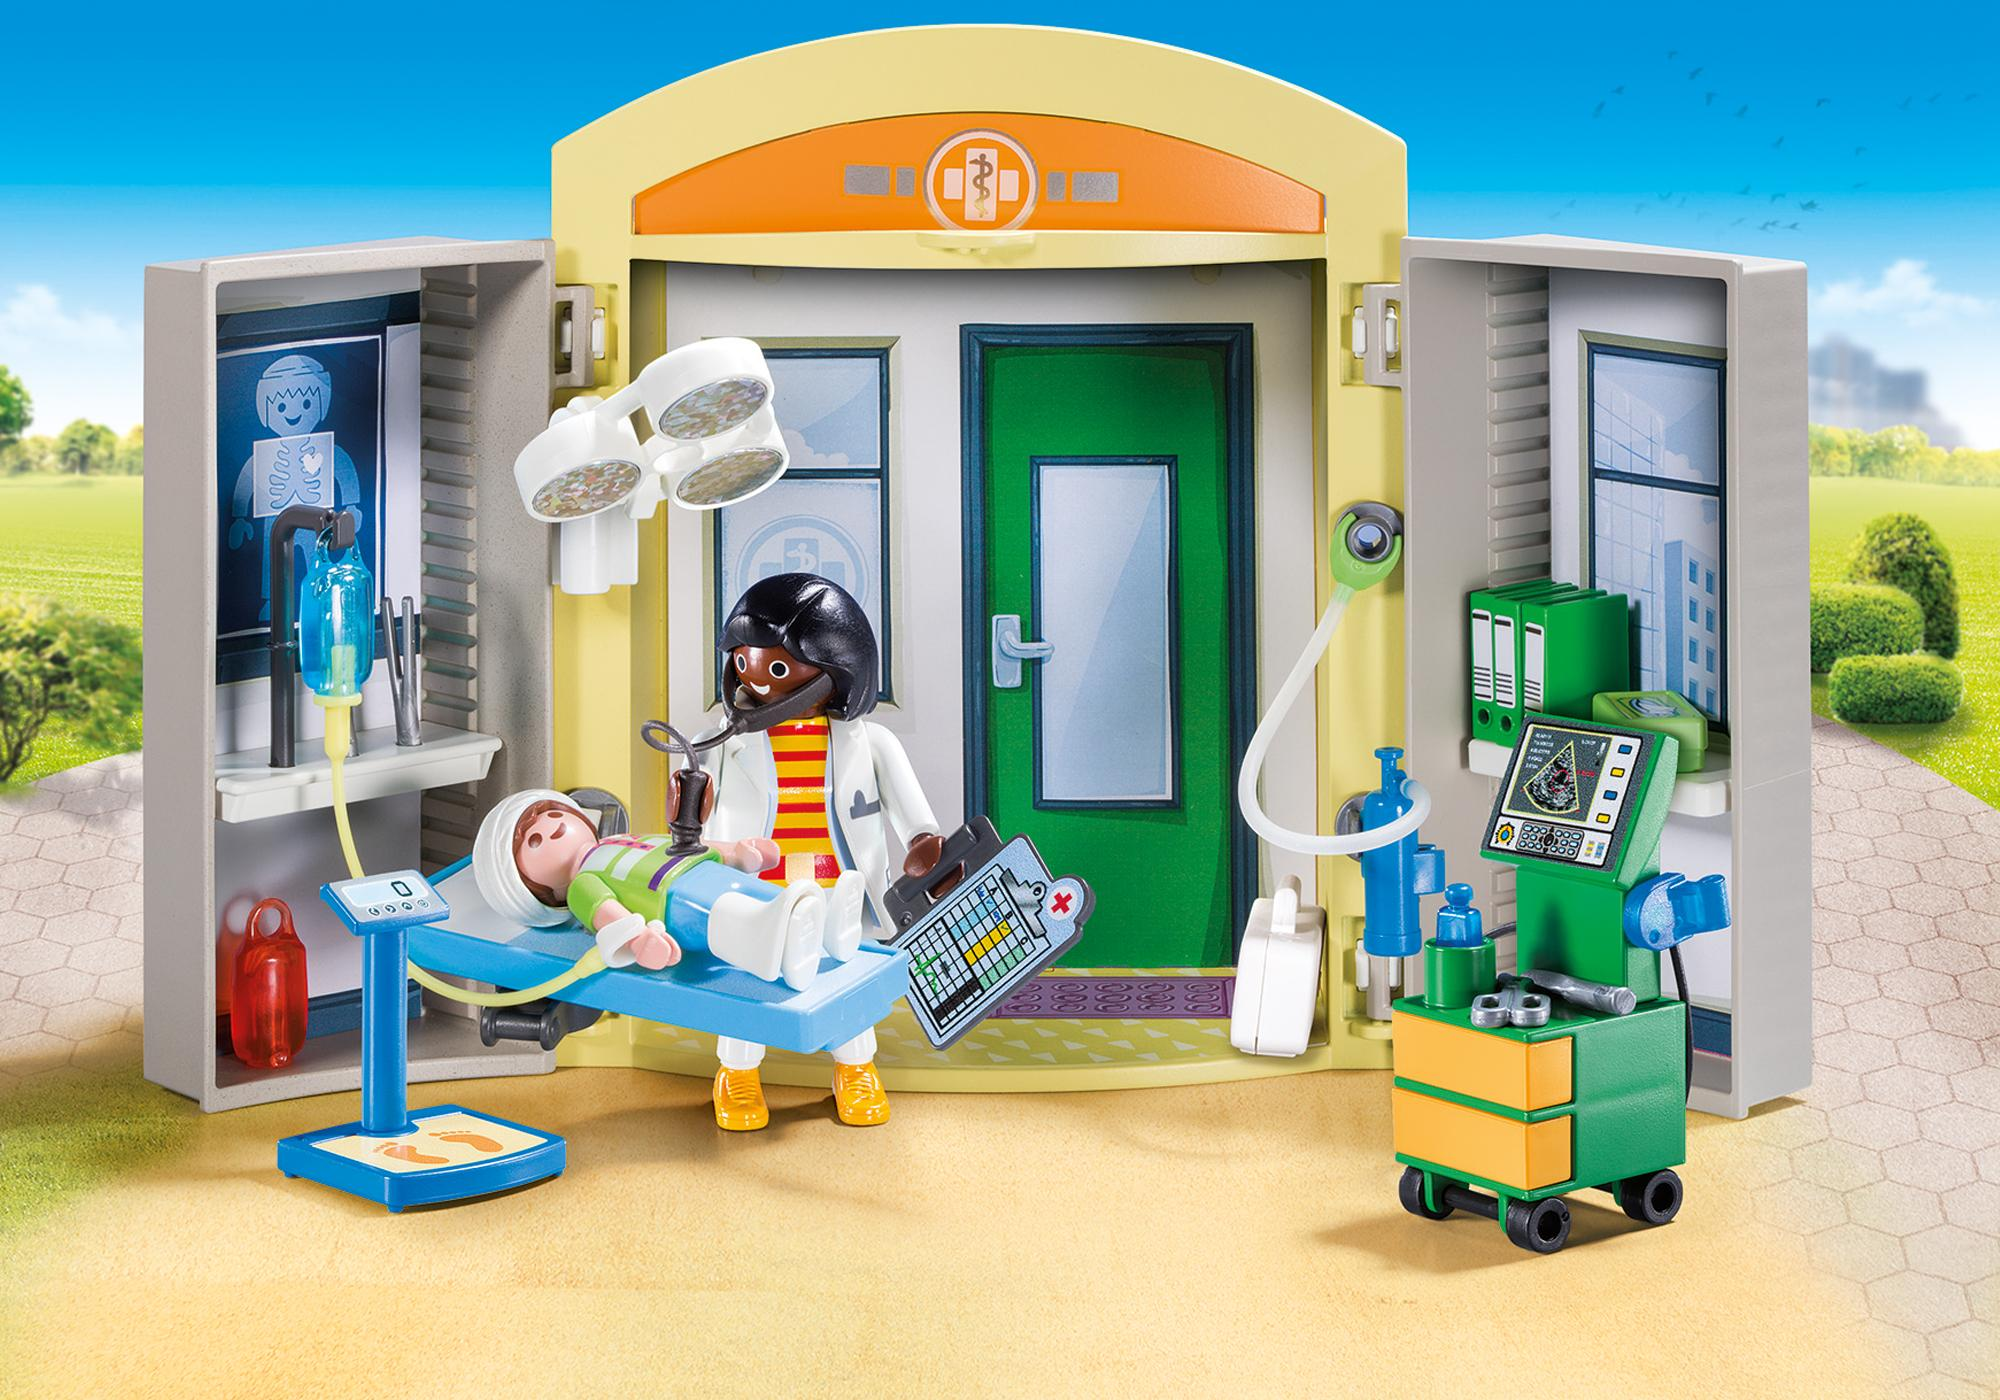 http://media.playmobil.com/i/playmobil/9110_product_detail/Hospital Play Box